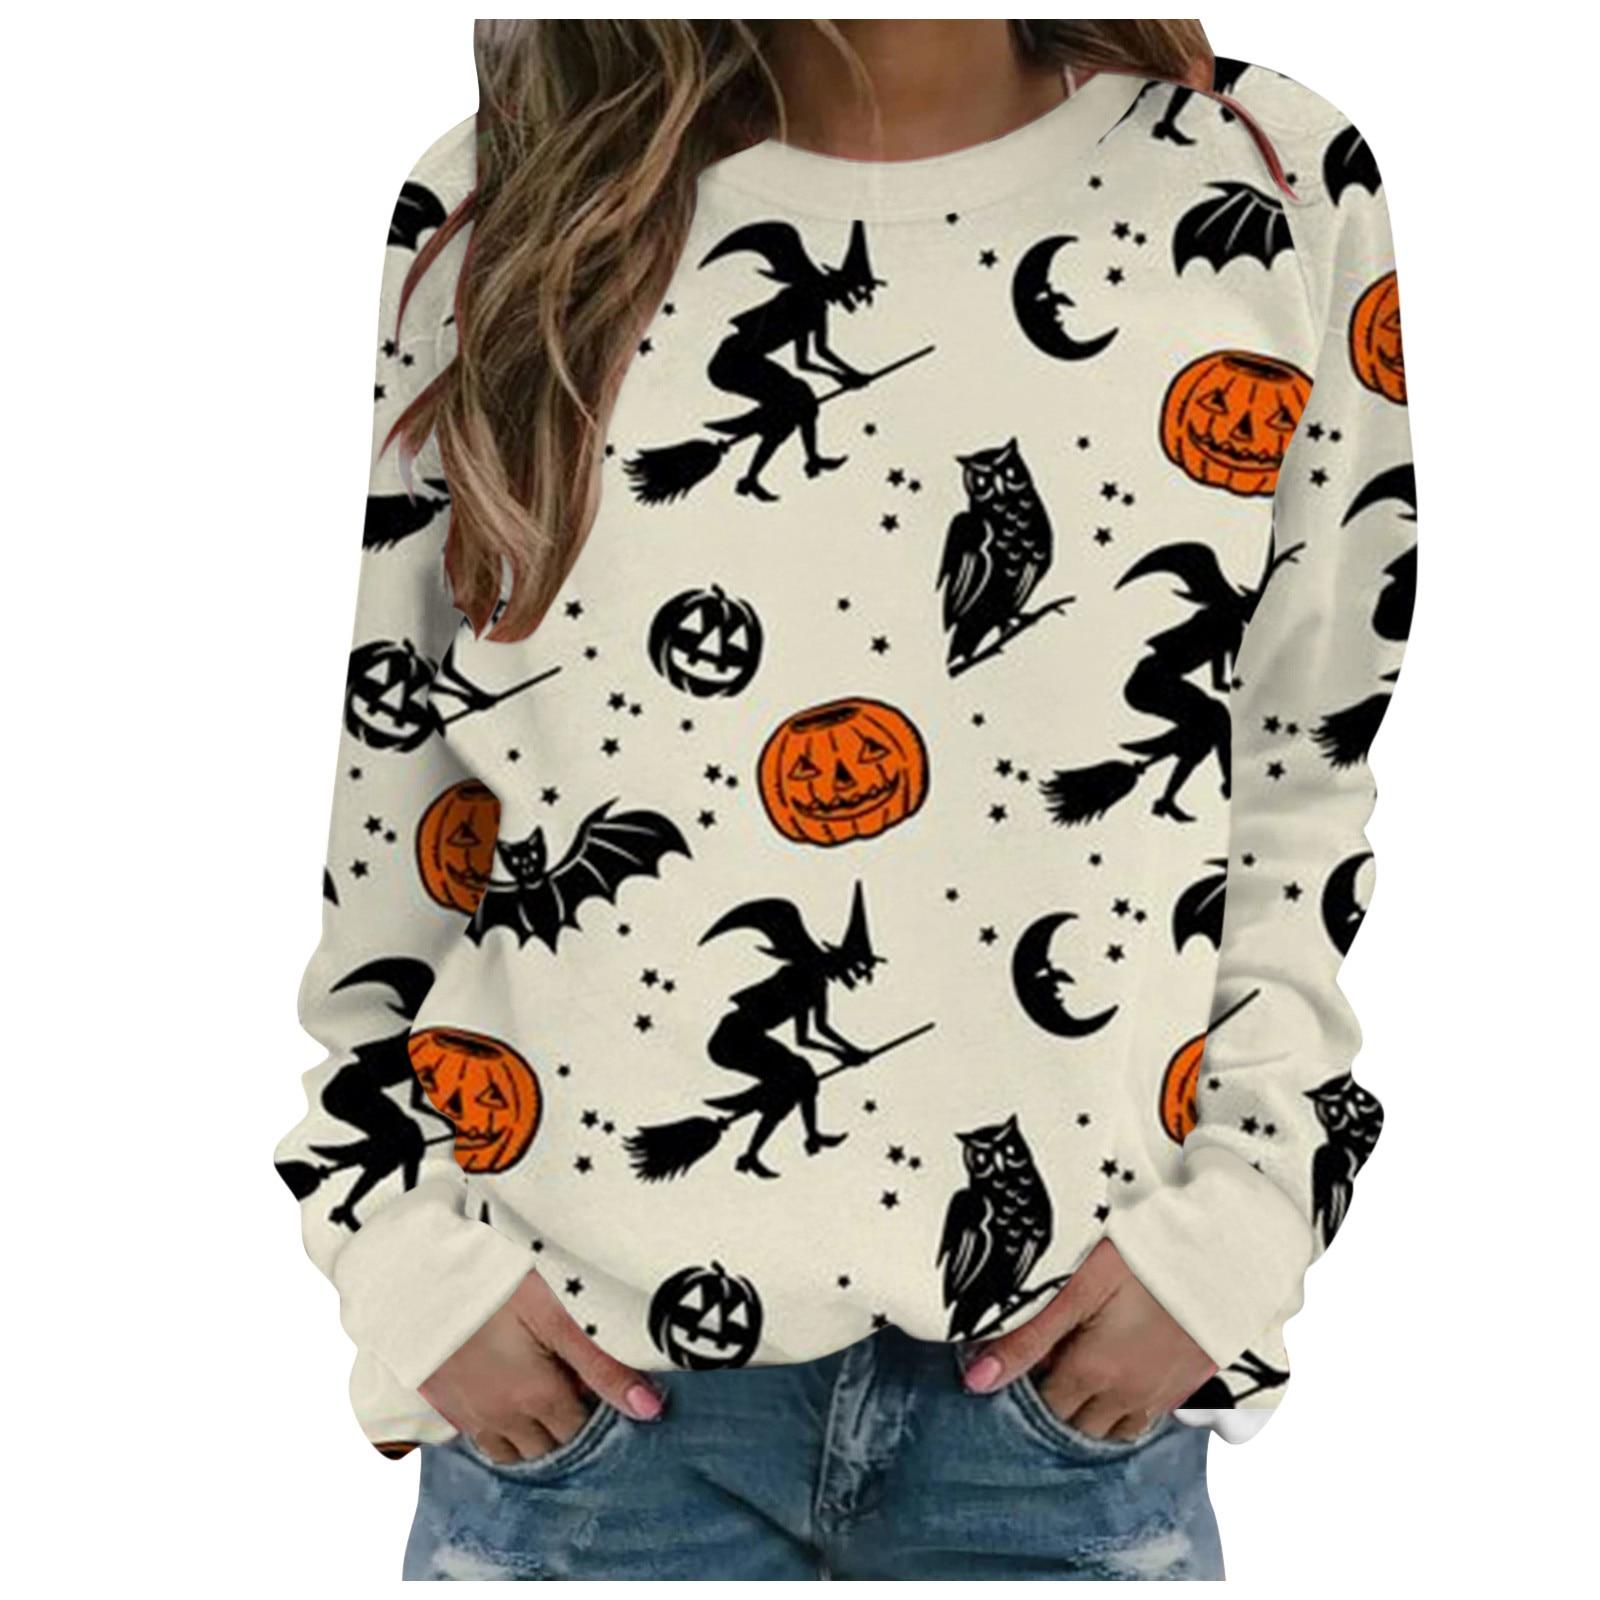 Las mujeres Impresión De Halloween sudadera De manga larga Casual Blusa Jersey...